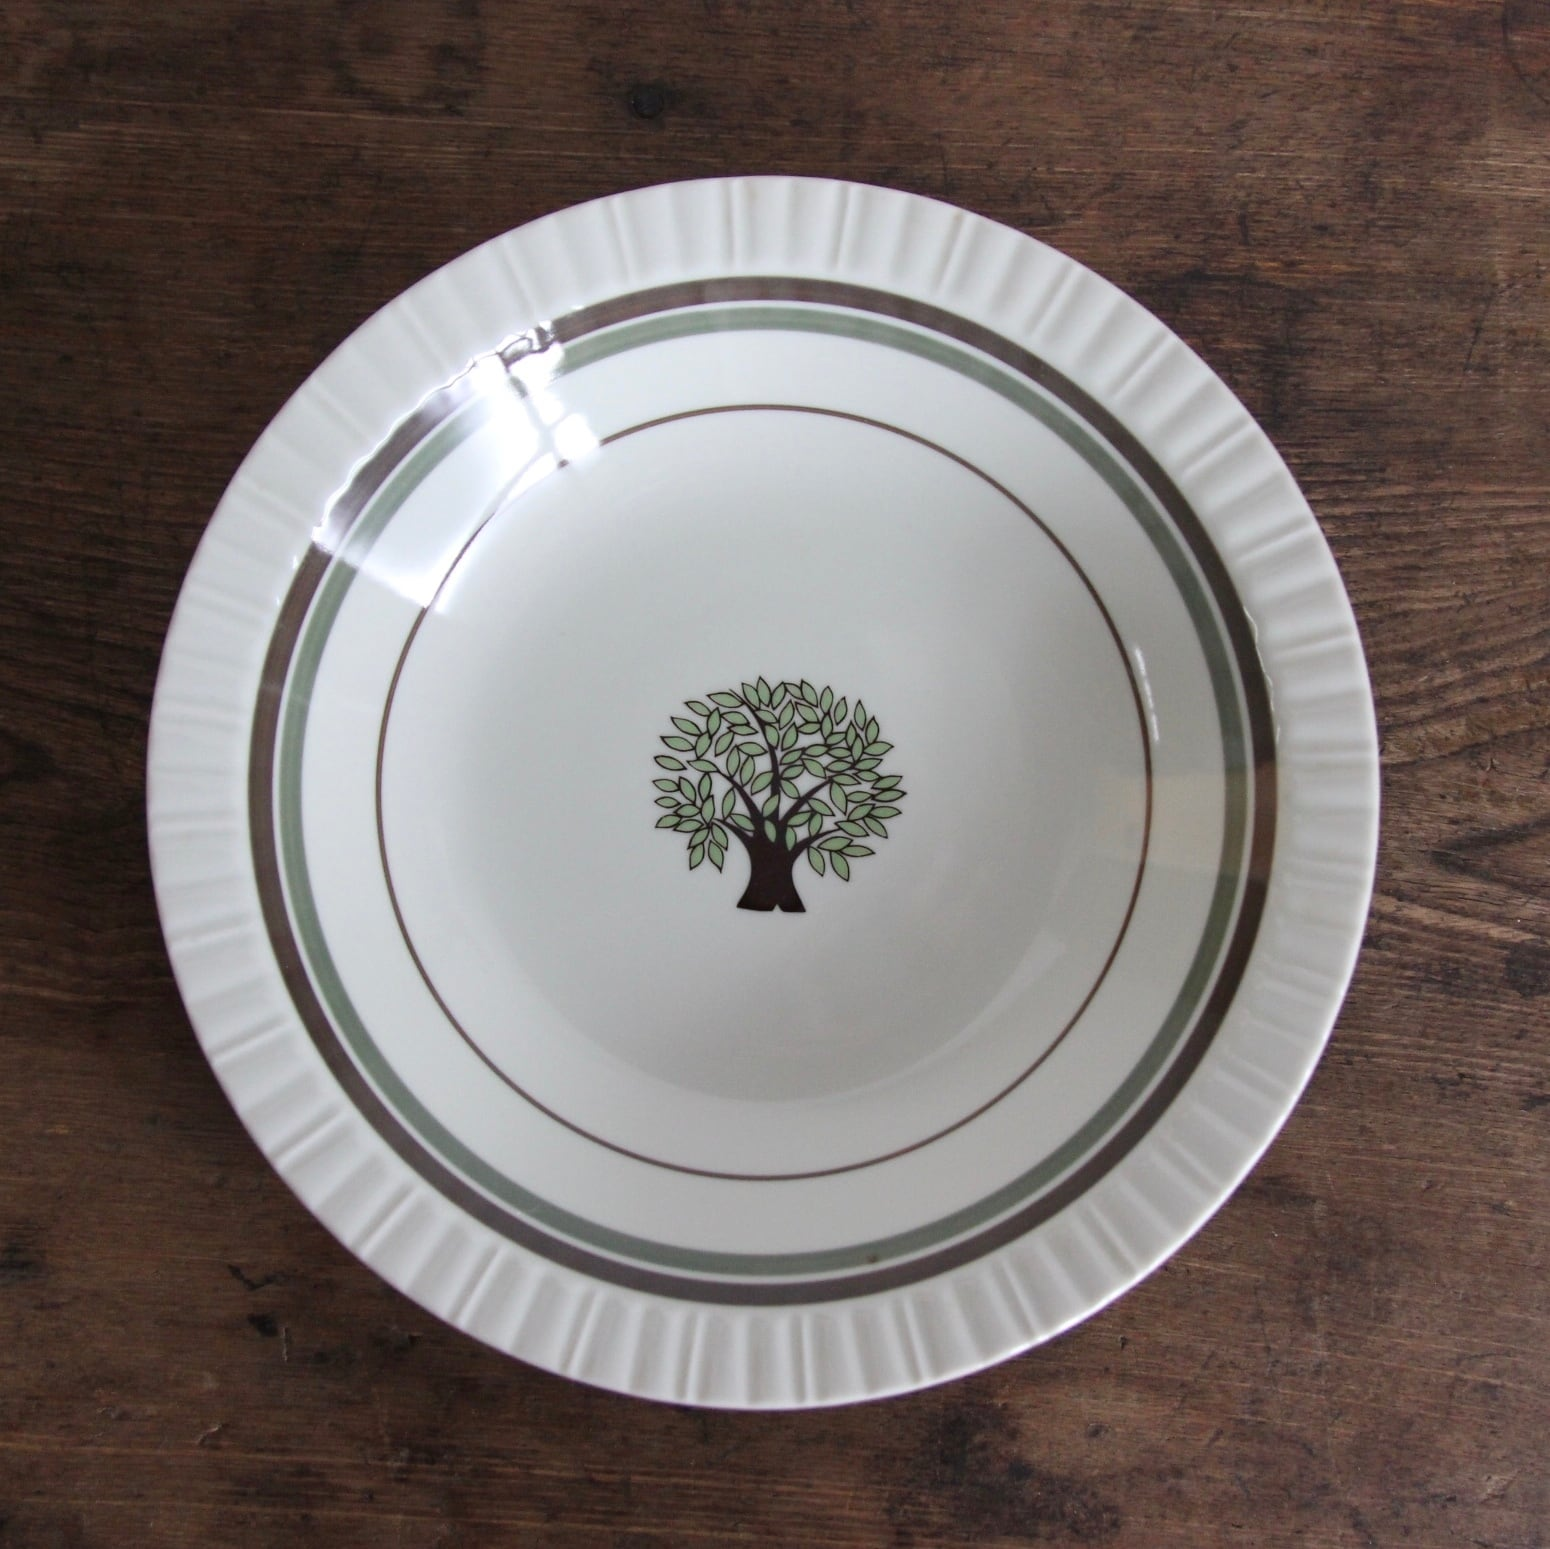 marumi ツリー柄 ボウル皿 在庫4枚